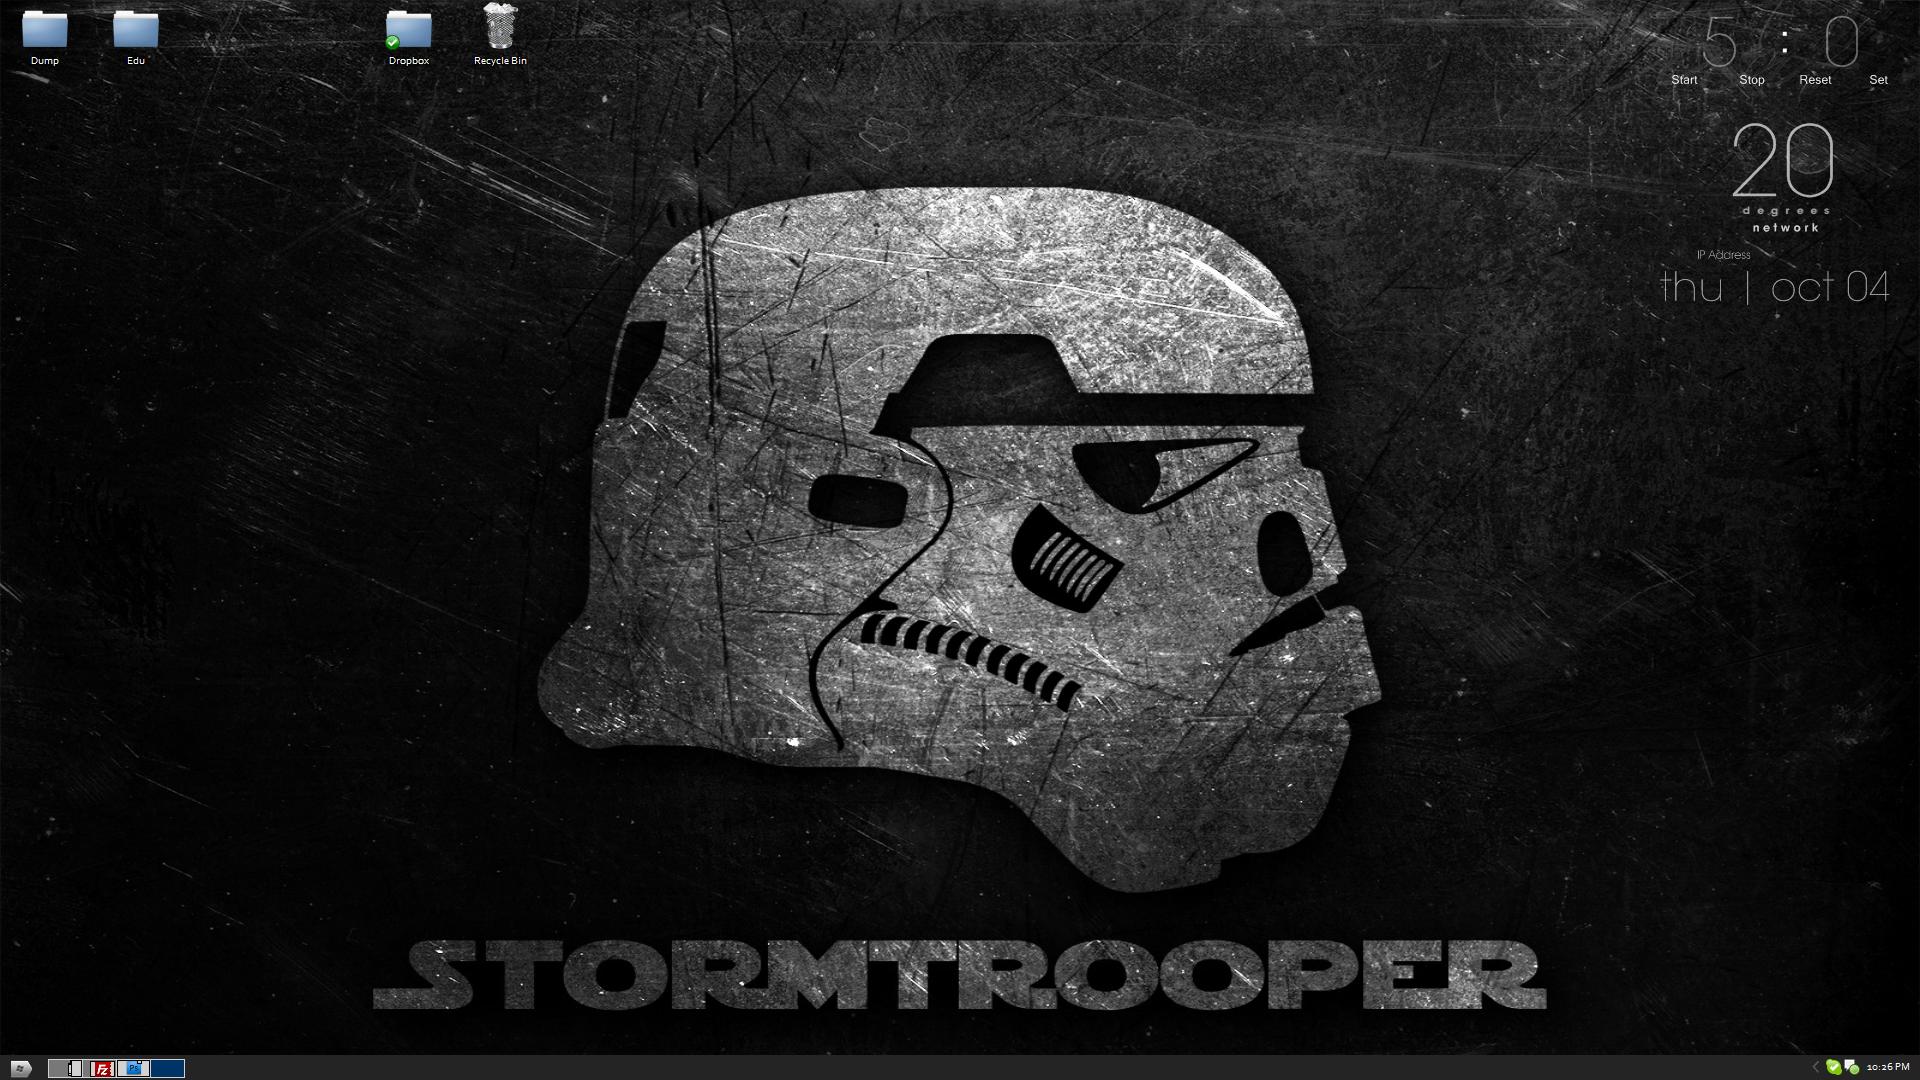 stormtrooper wallpaper 1920x1080